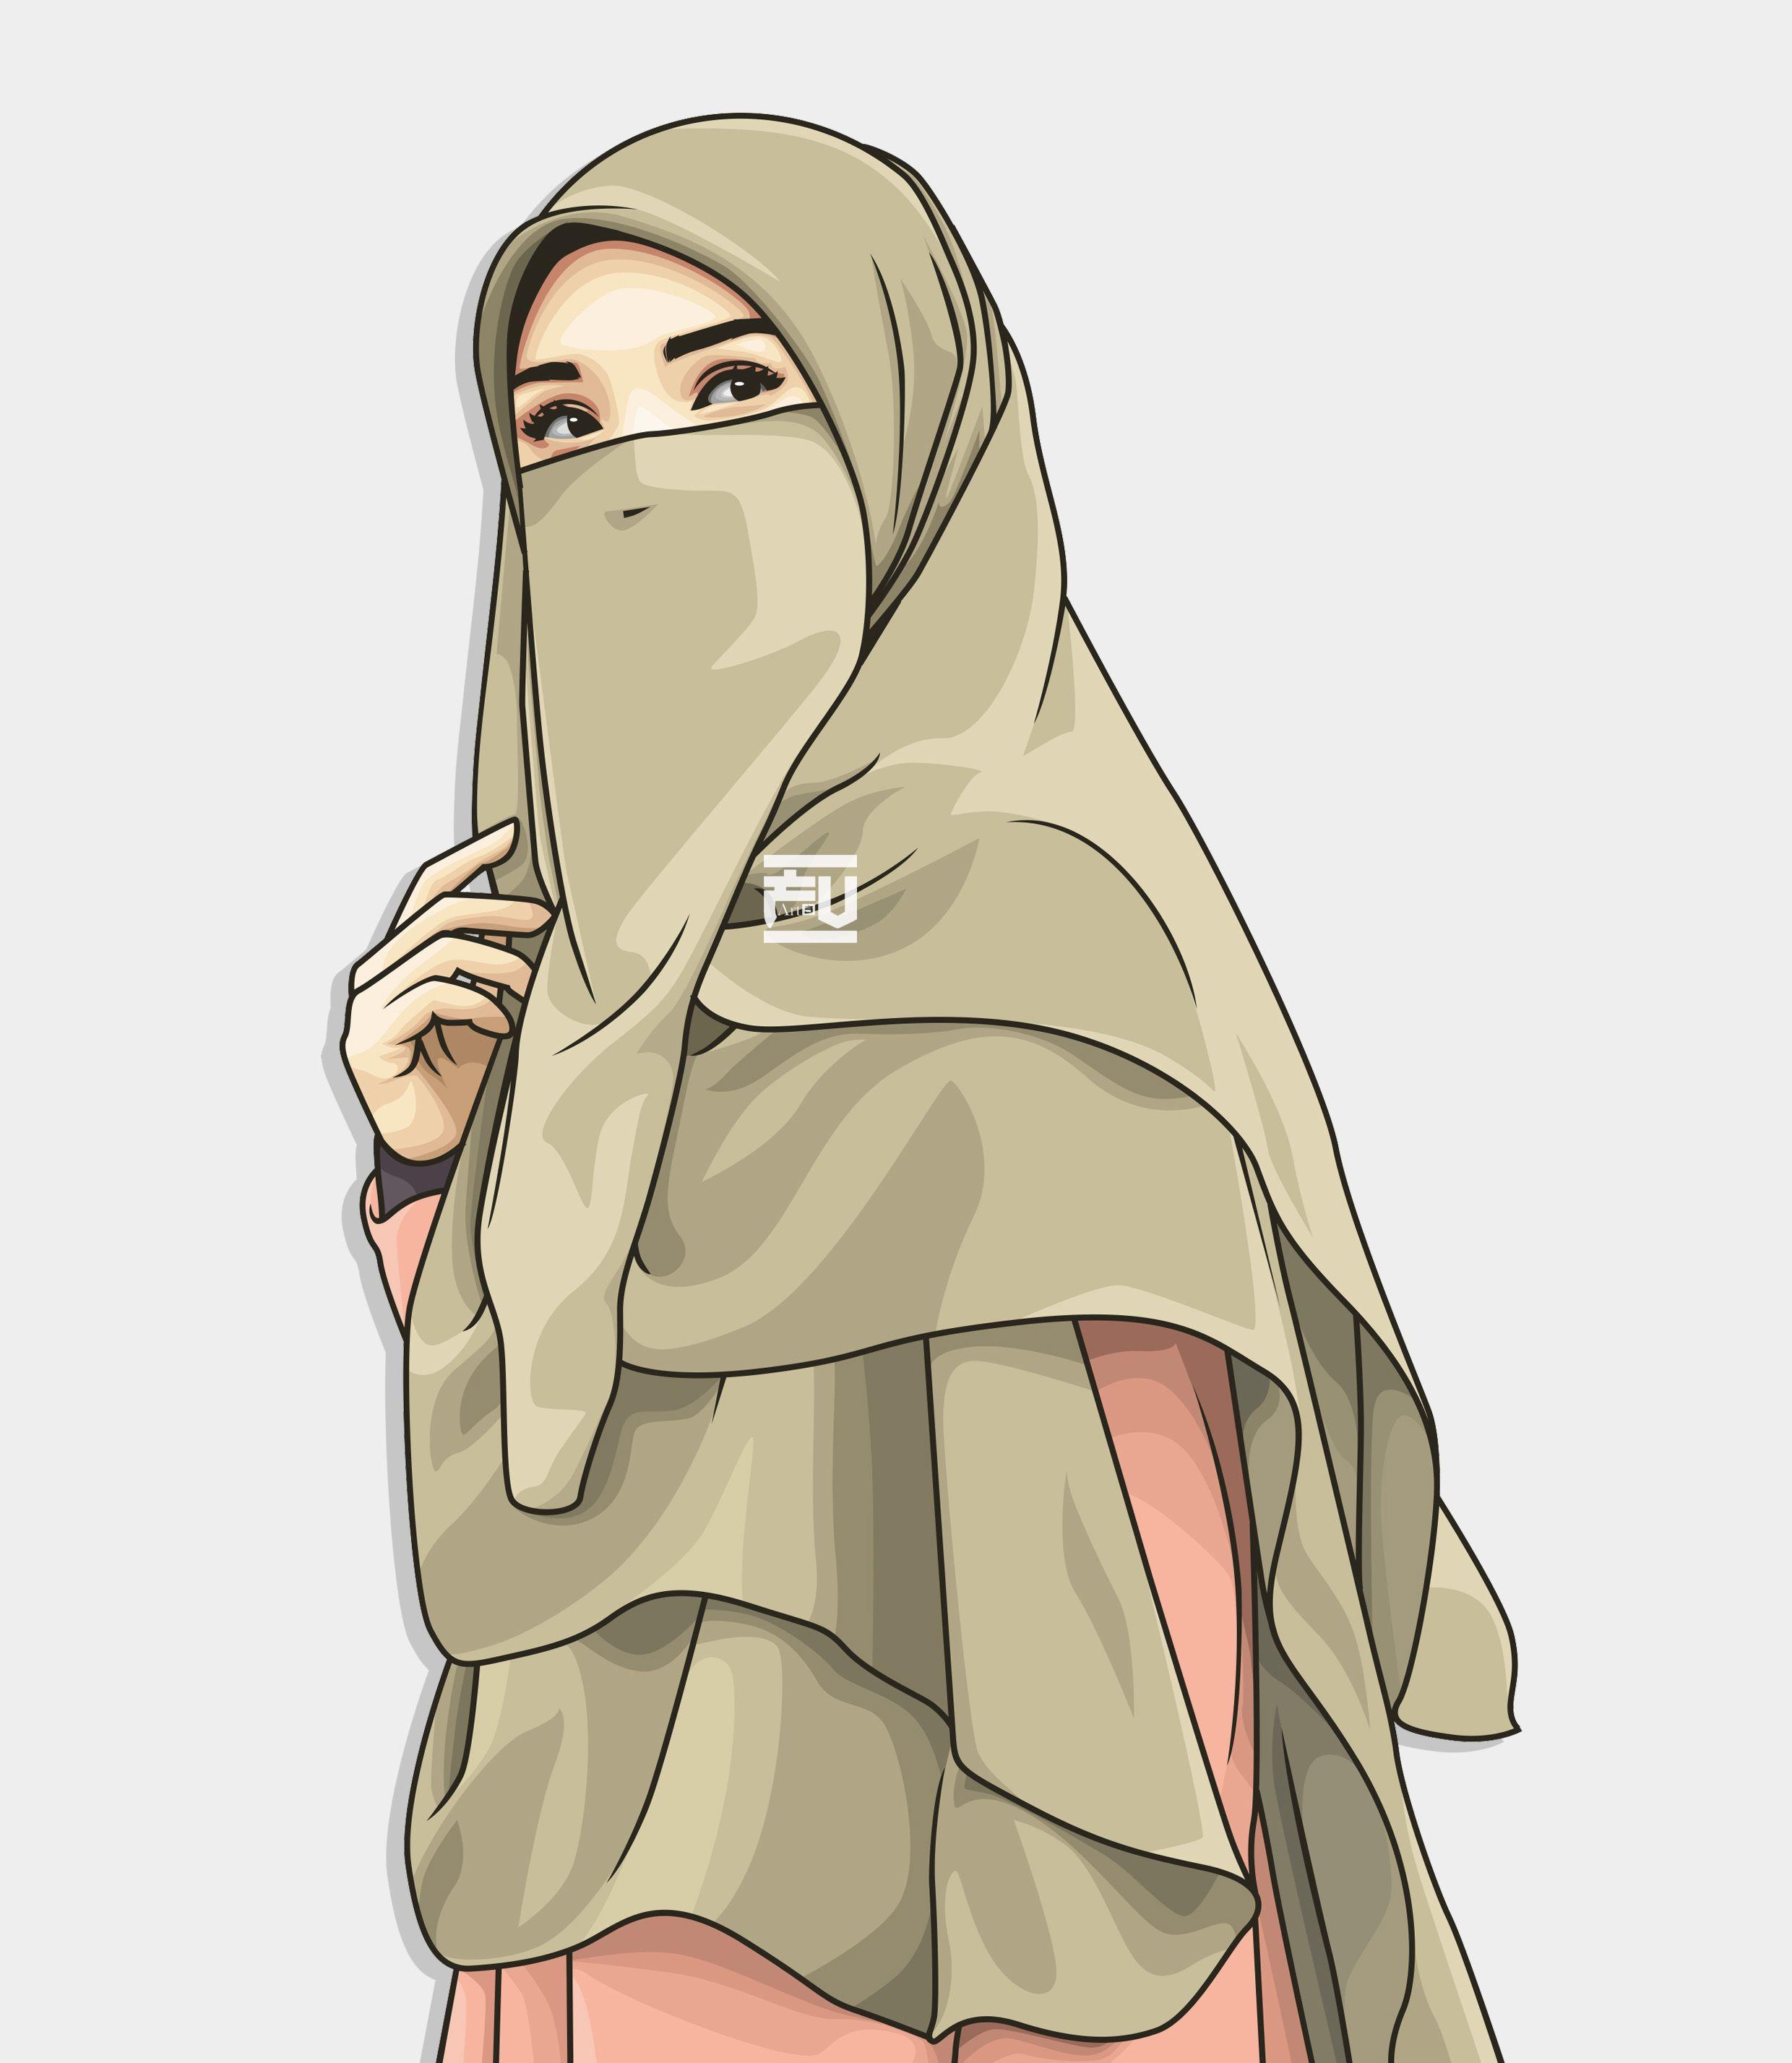 Kartun Muslimah Bercadar Cantik 2480x2855 Wallpaper Teahub Io